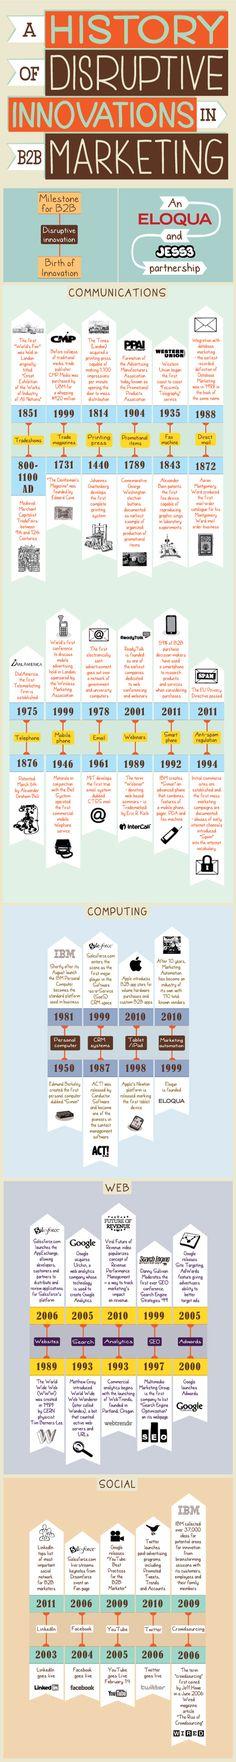 Eloqua x JESS3: Disruptive Innovations Infographic